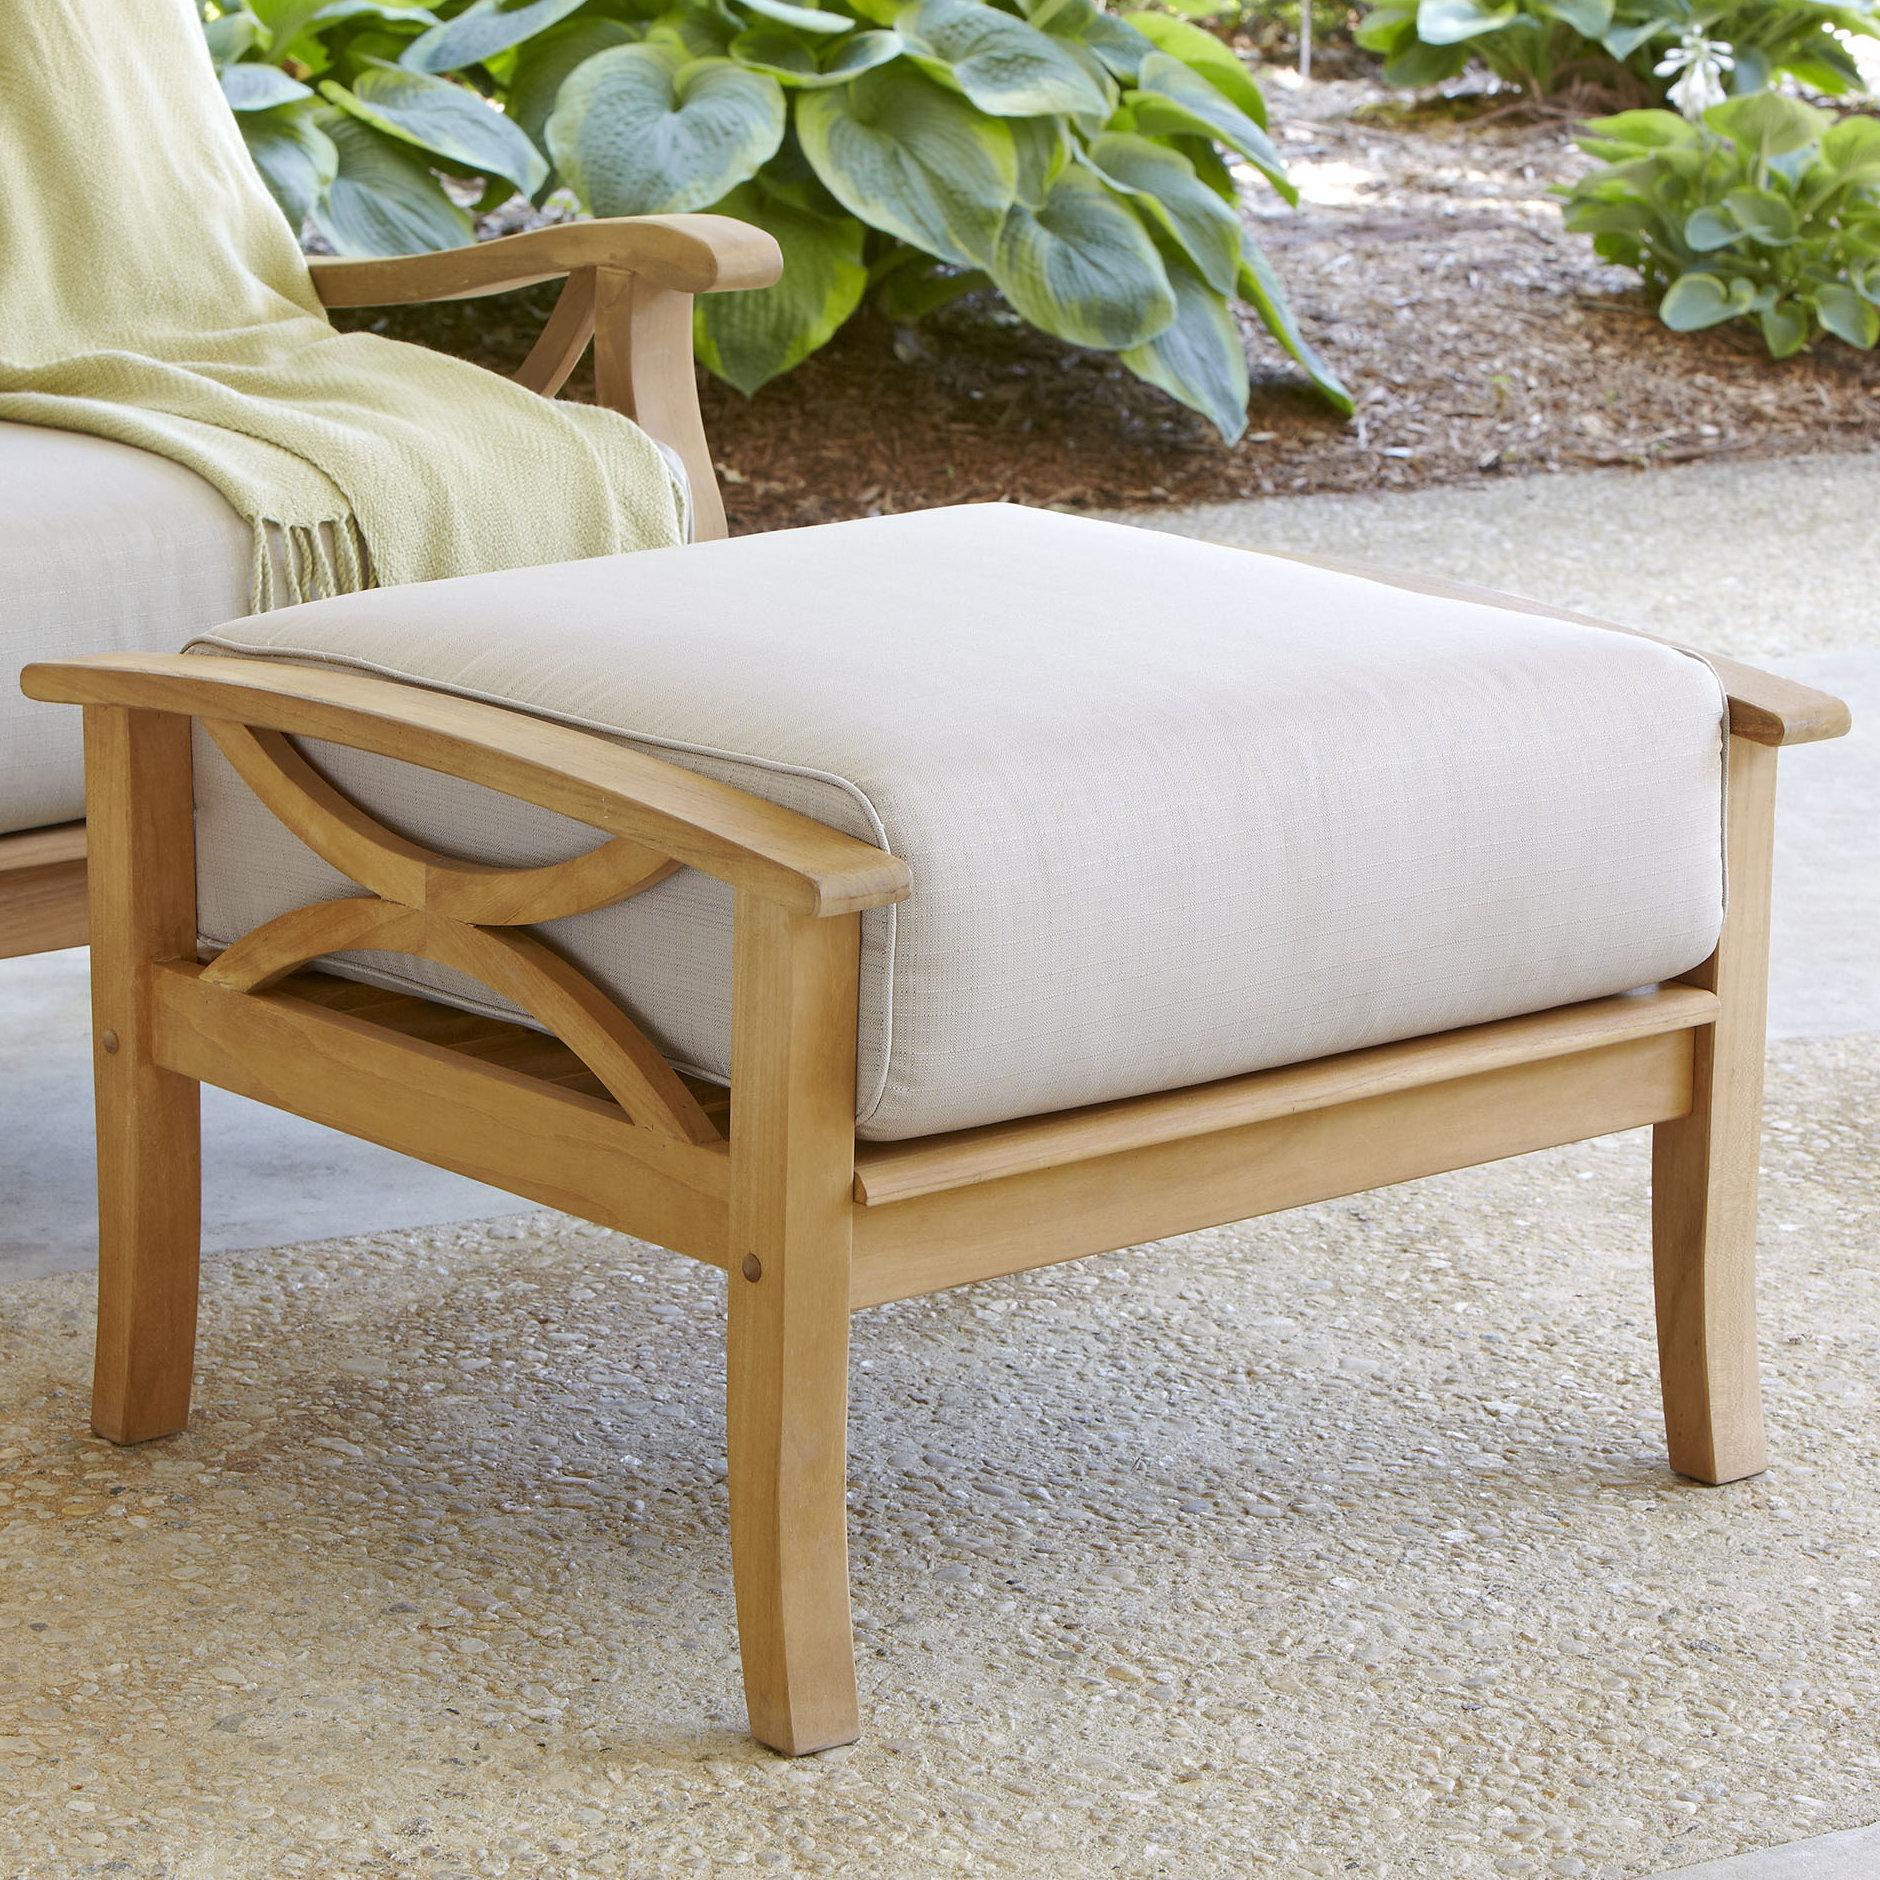 Brunswick Teak Loveseats With Cushions Intended For 2019 Brunswick Teak Ottoman With Cushion (View 4 of 20)